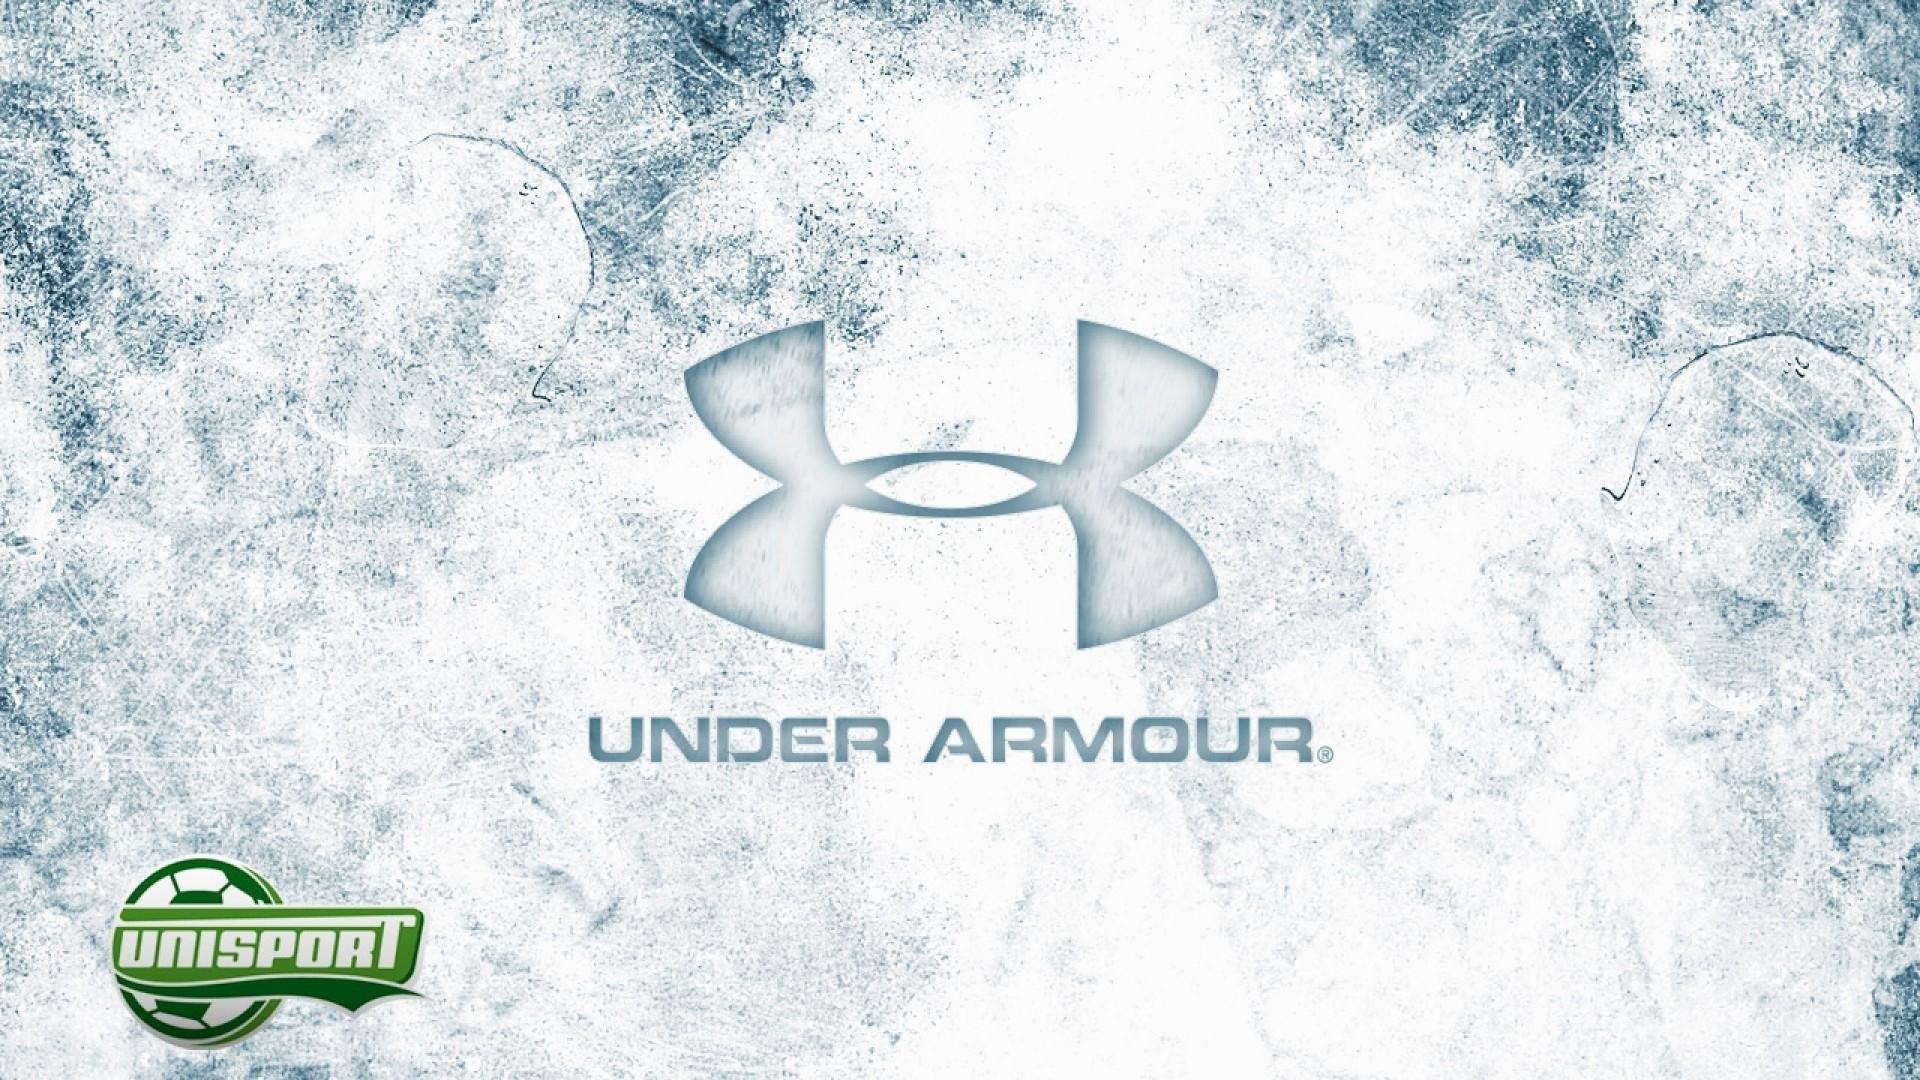 Under Armour wallpaper photo hd